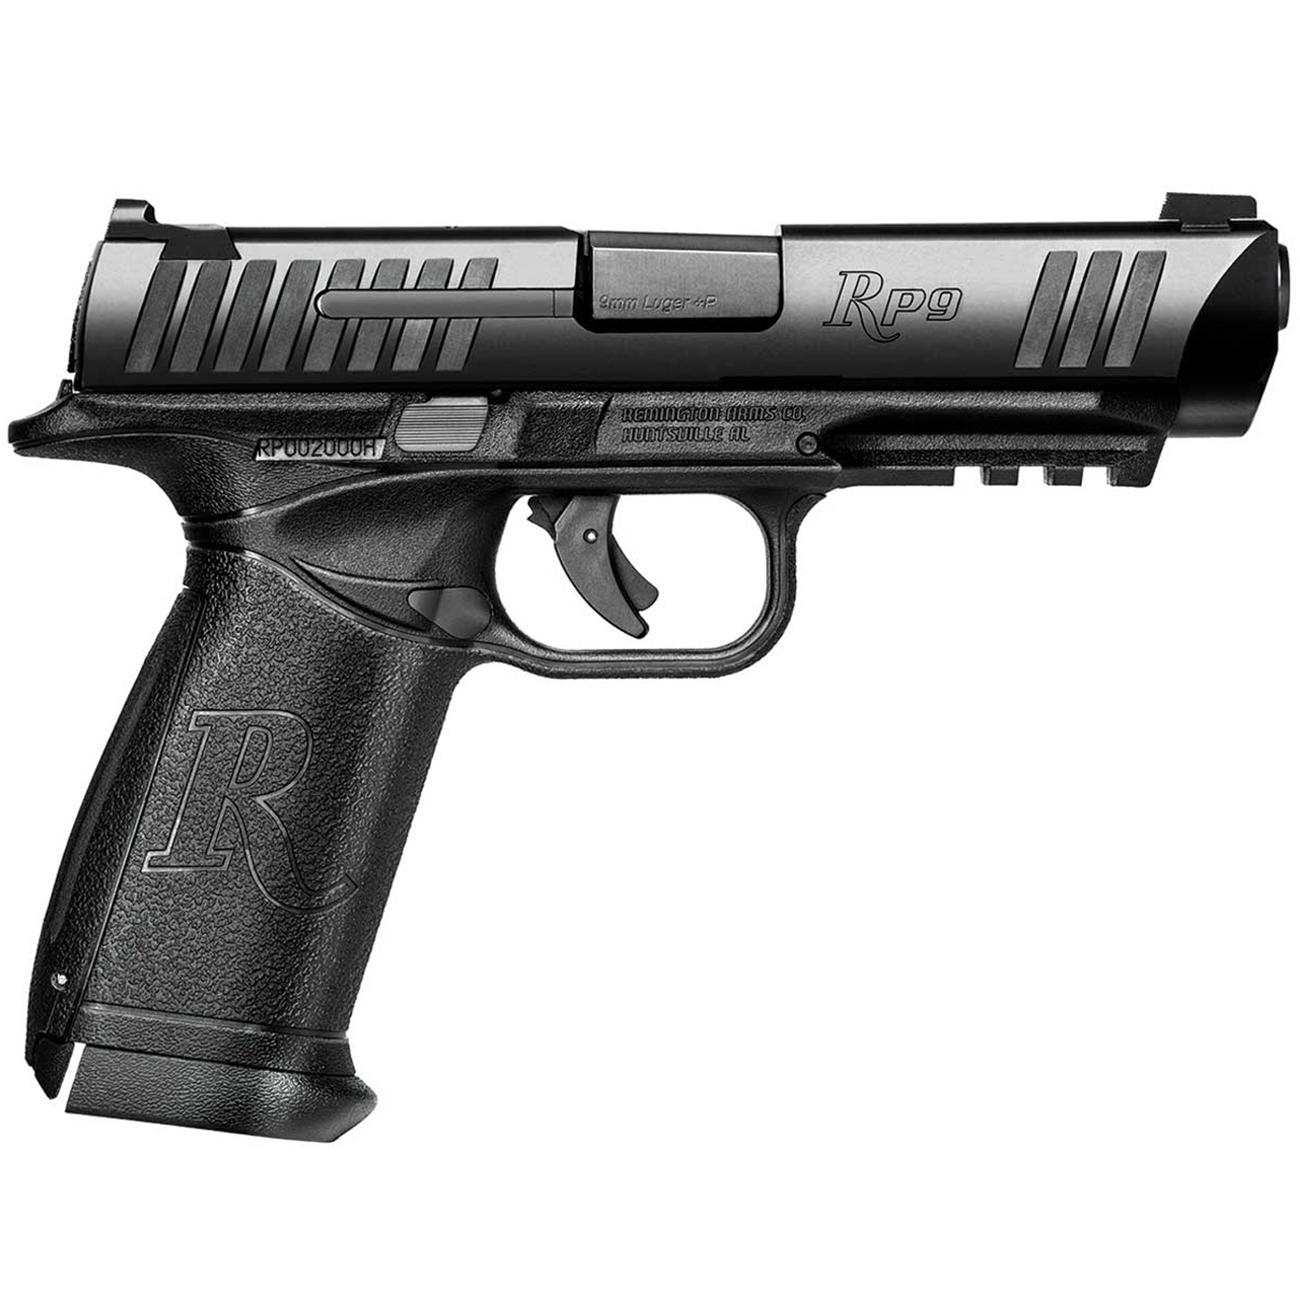 Remington RP9 Handgun